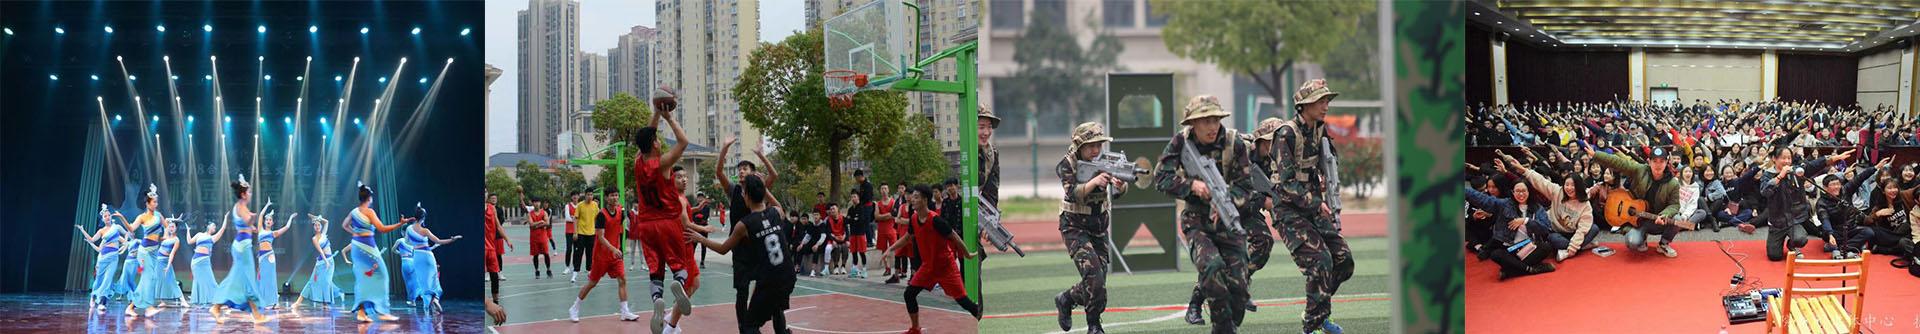 校yuan